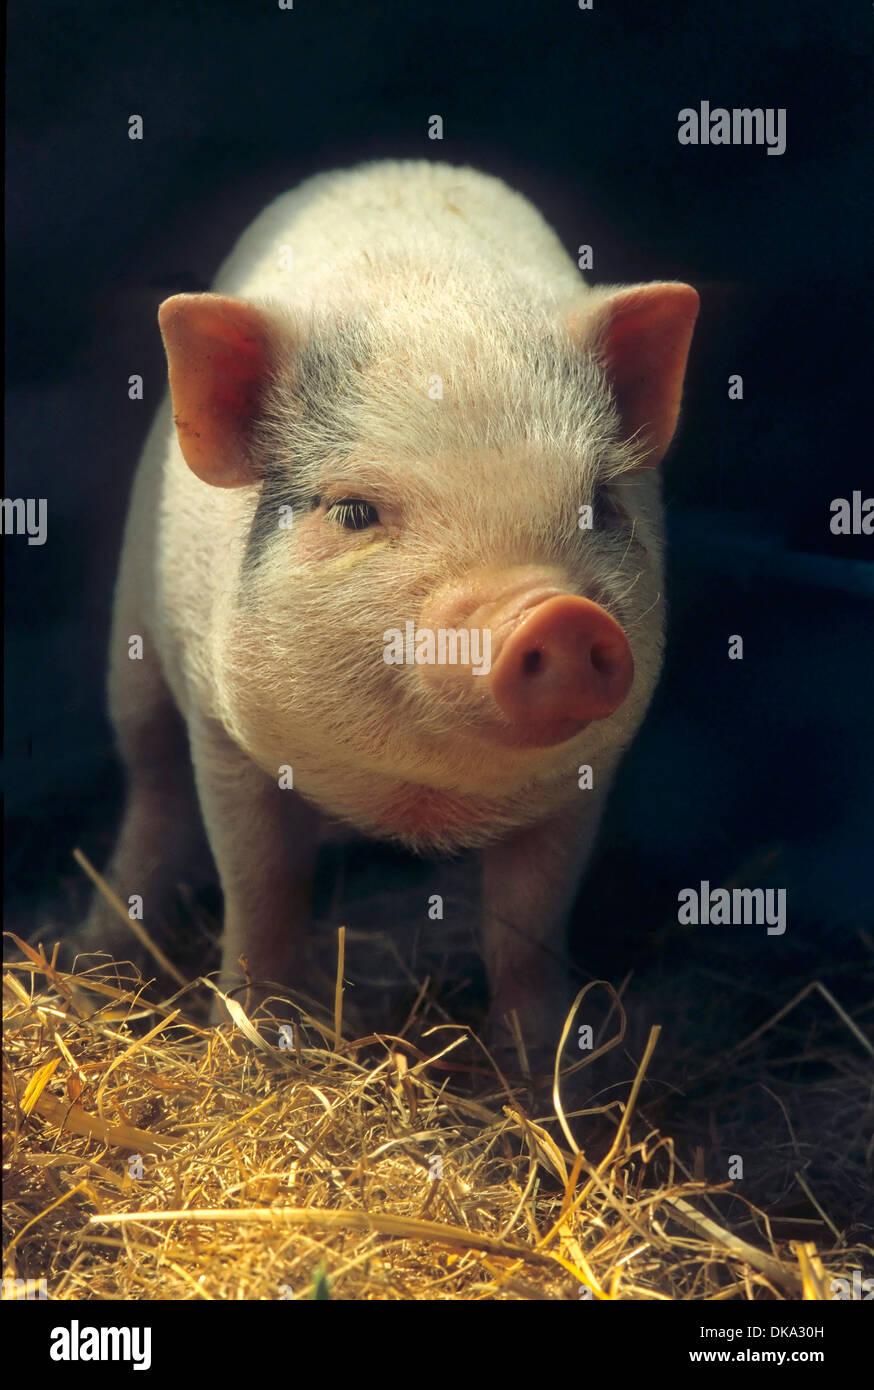 Hausschwein (Sus scrofa domestica), maiale domestico (Sus scrofa domesticus) Sus domesticus, suina, hog Foto Stock